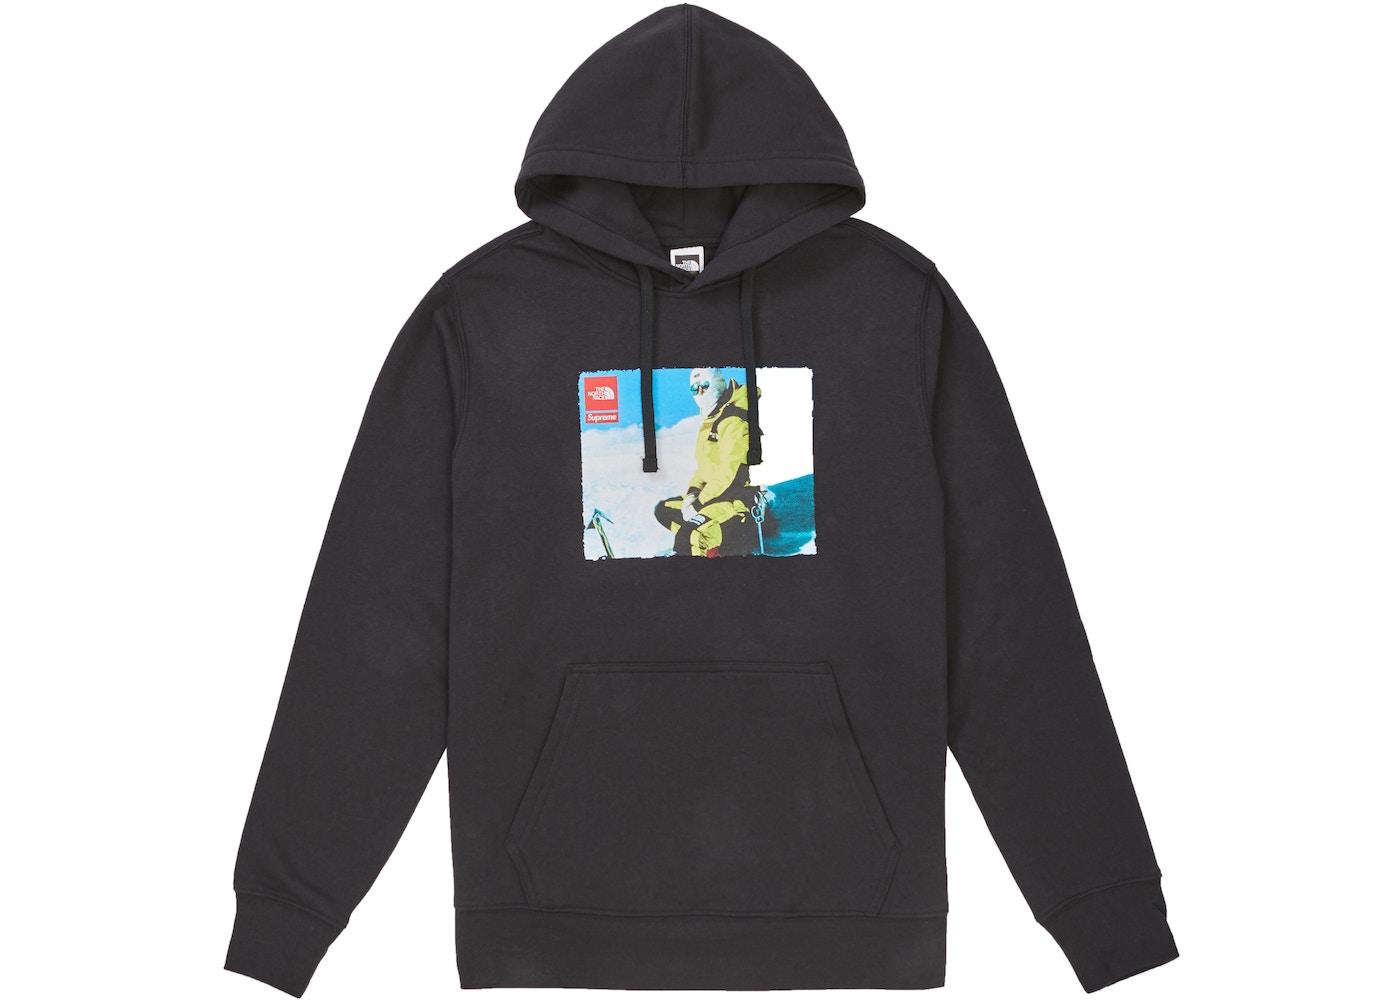 62d24a281 Supreme Tops/Sweatshirts - Buy & Sell Streetwear